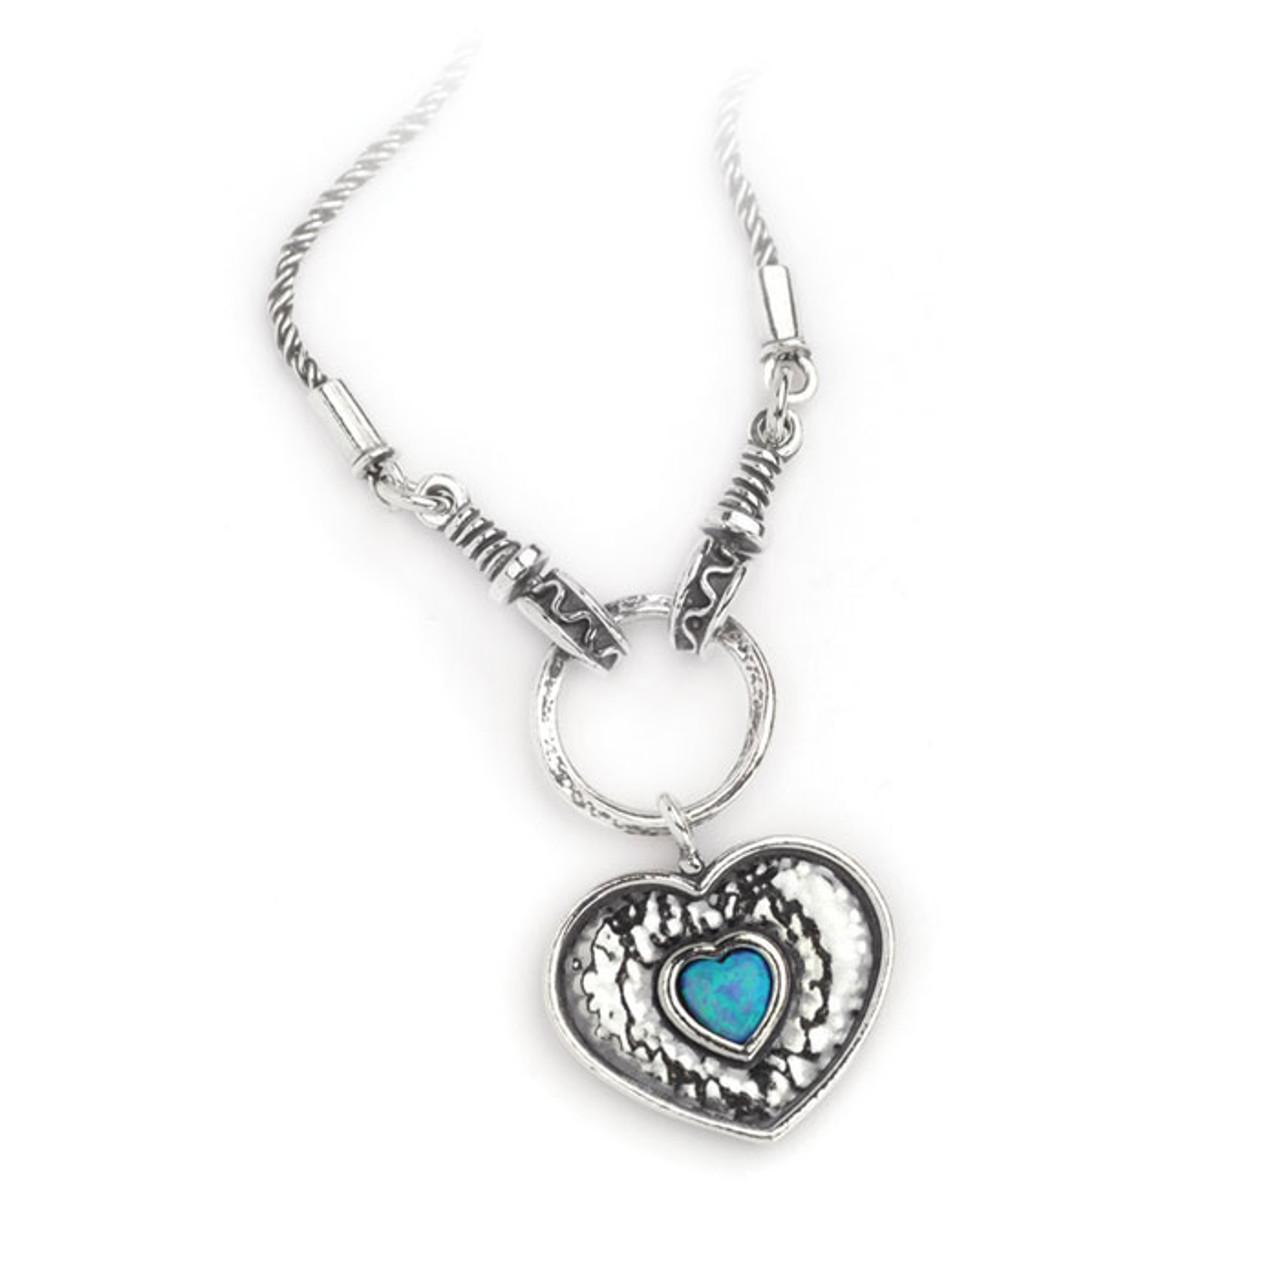 Asn982 chunky heart with opal heart necklace on rope chain aviv silver asn982 chunky heart with opal heart necklace on rope chain aloadofball Gallery